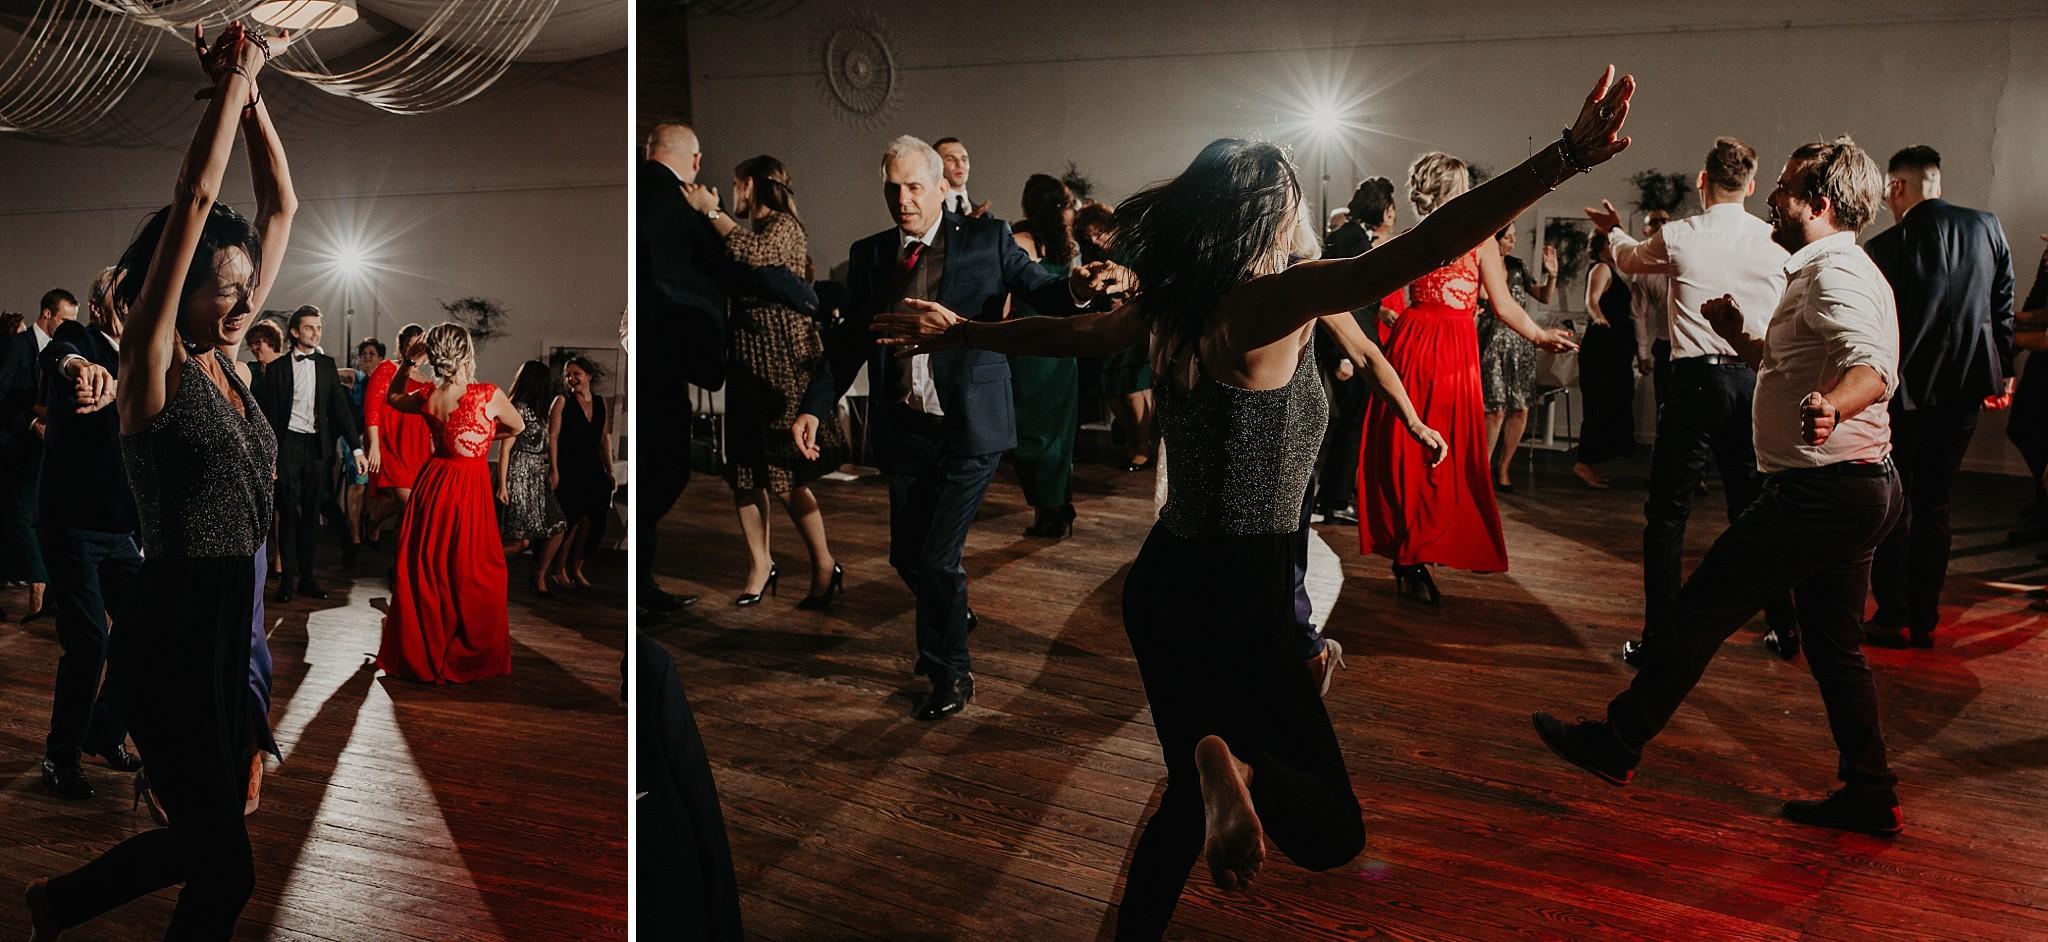 fotograf poznan wesele dobra truskawka piekne wesele pod poznaniem wesele w dobrej truskawce piekna para mloda slub marzen slub koronawirus slub listopad wesele koronawirus 410